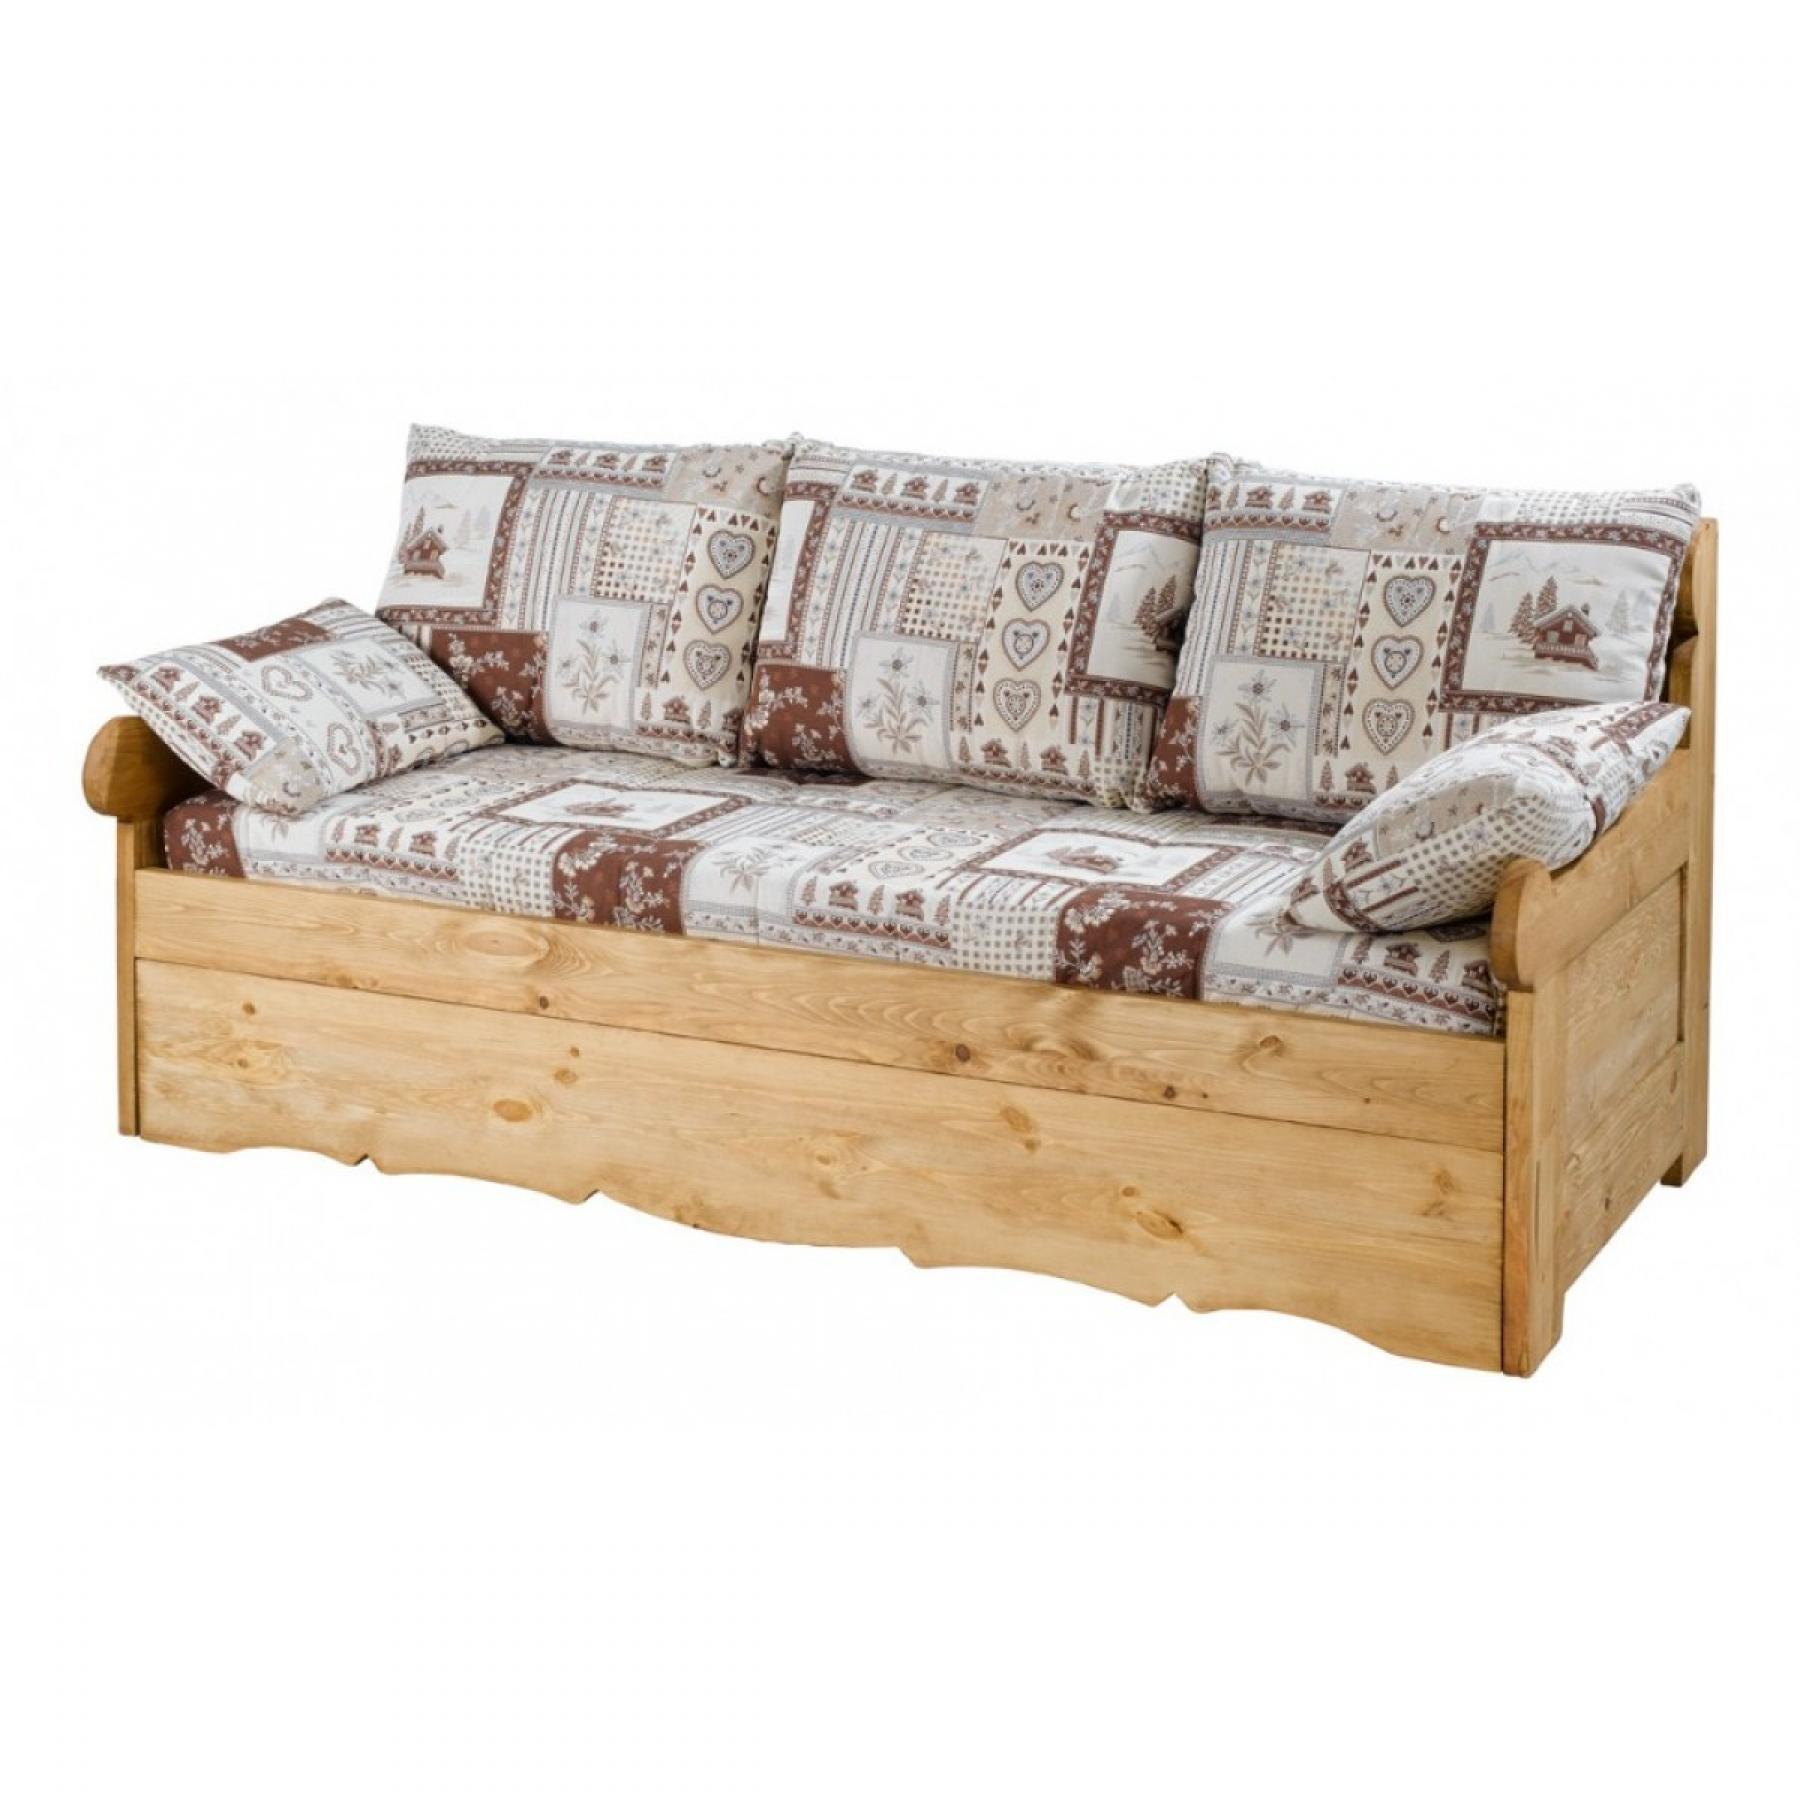 photos canap gigogne 2 places. Black Bedroom Furniture Sets. Home Design Ideas